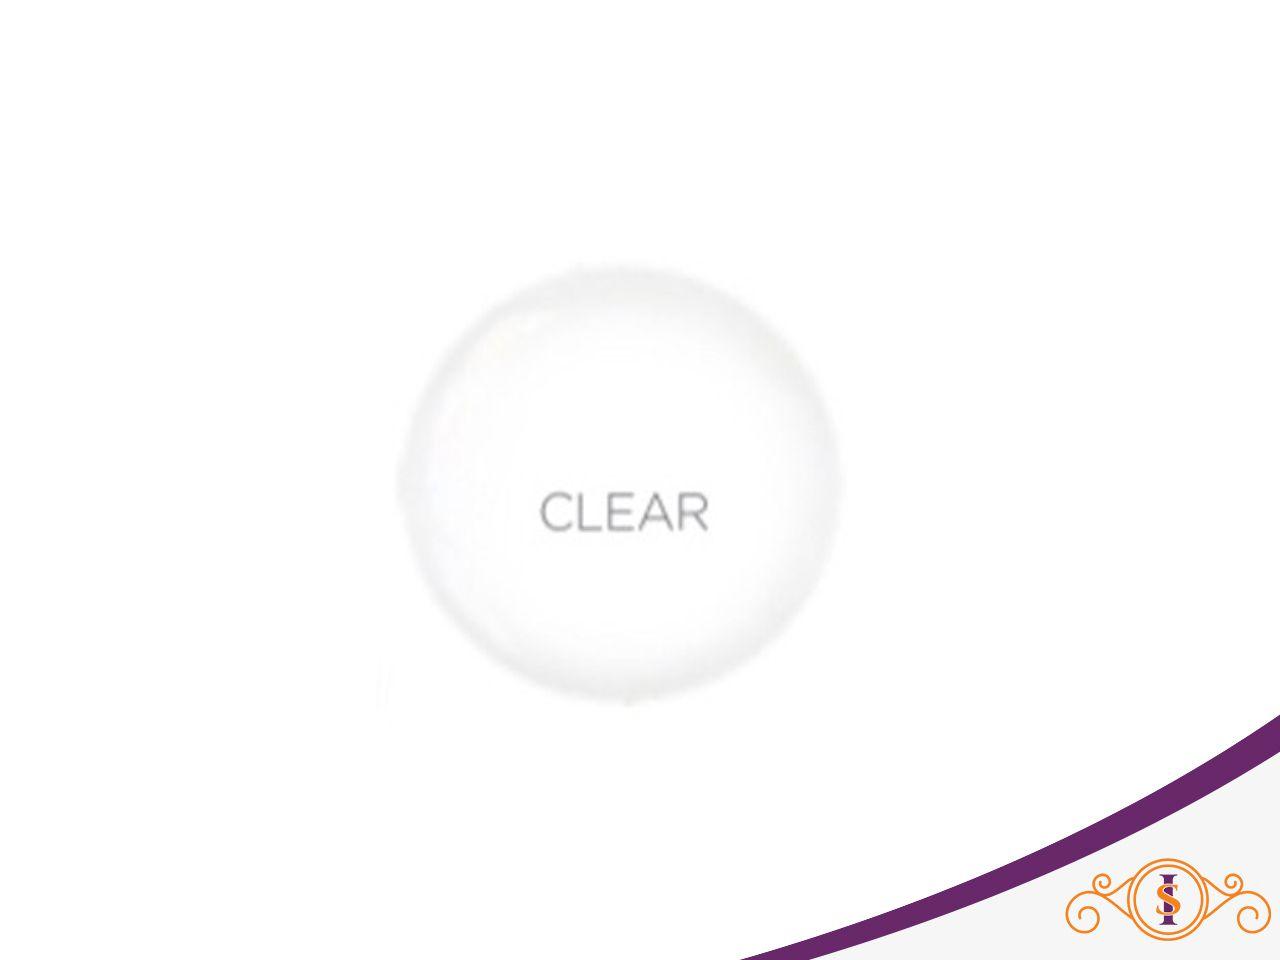 Gel - T3 Controlled Led/Uv 28g - Clear